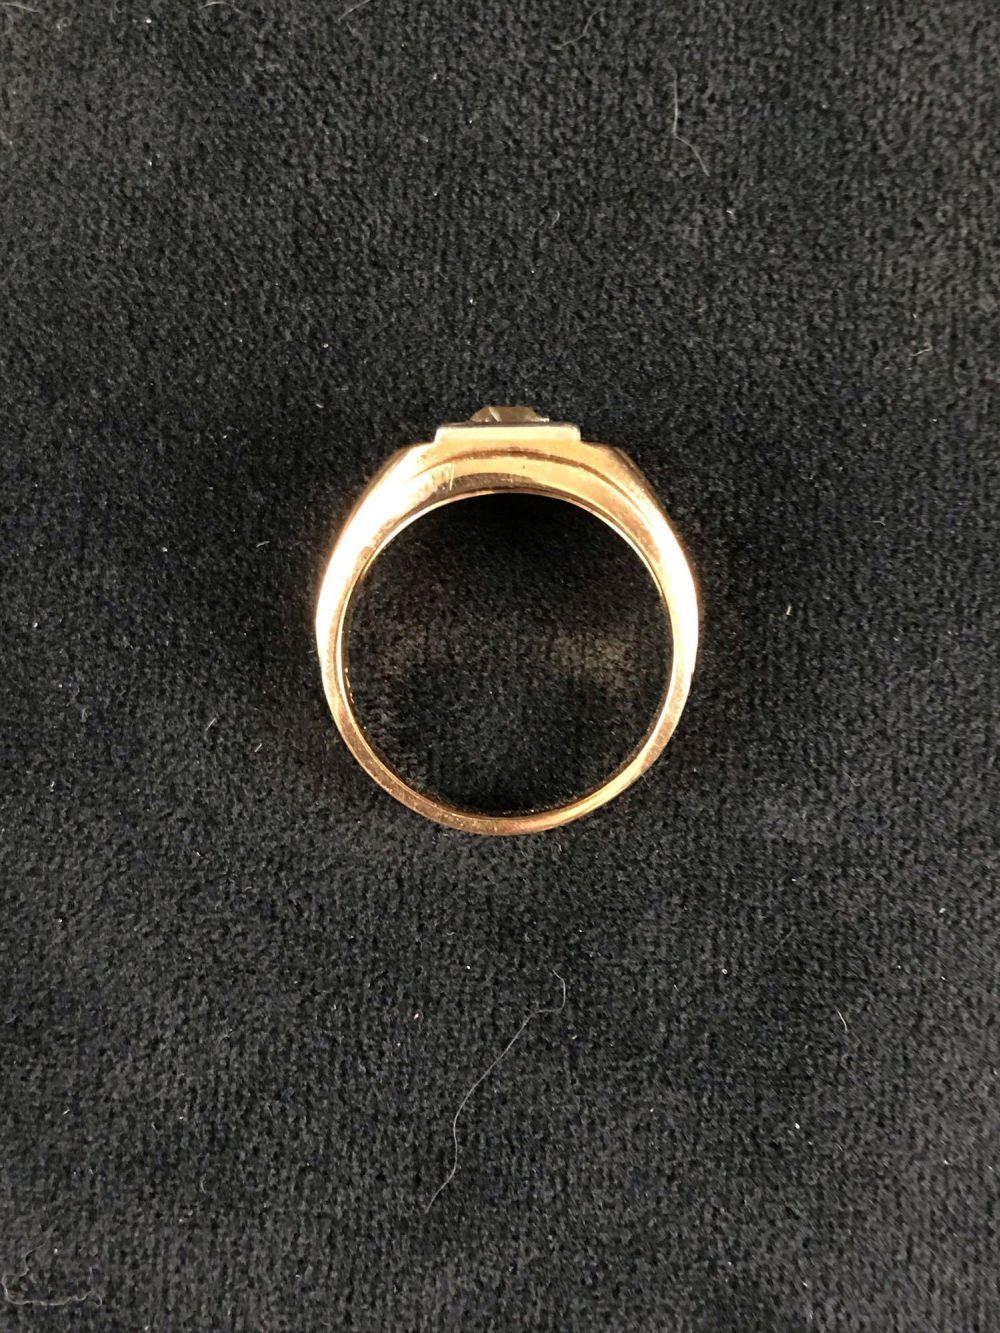 Lot 125: 14K Gold Diamond Signet Ring